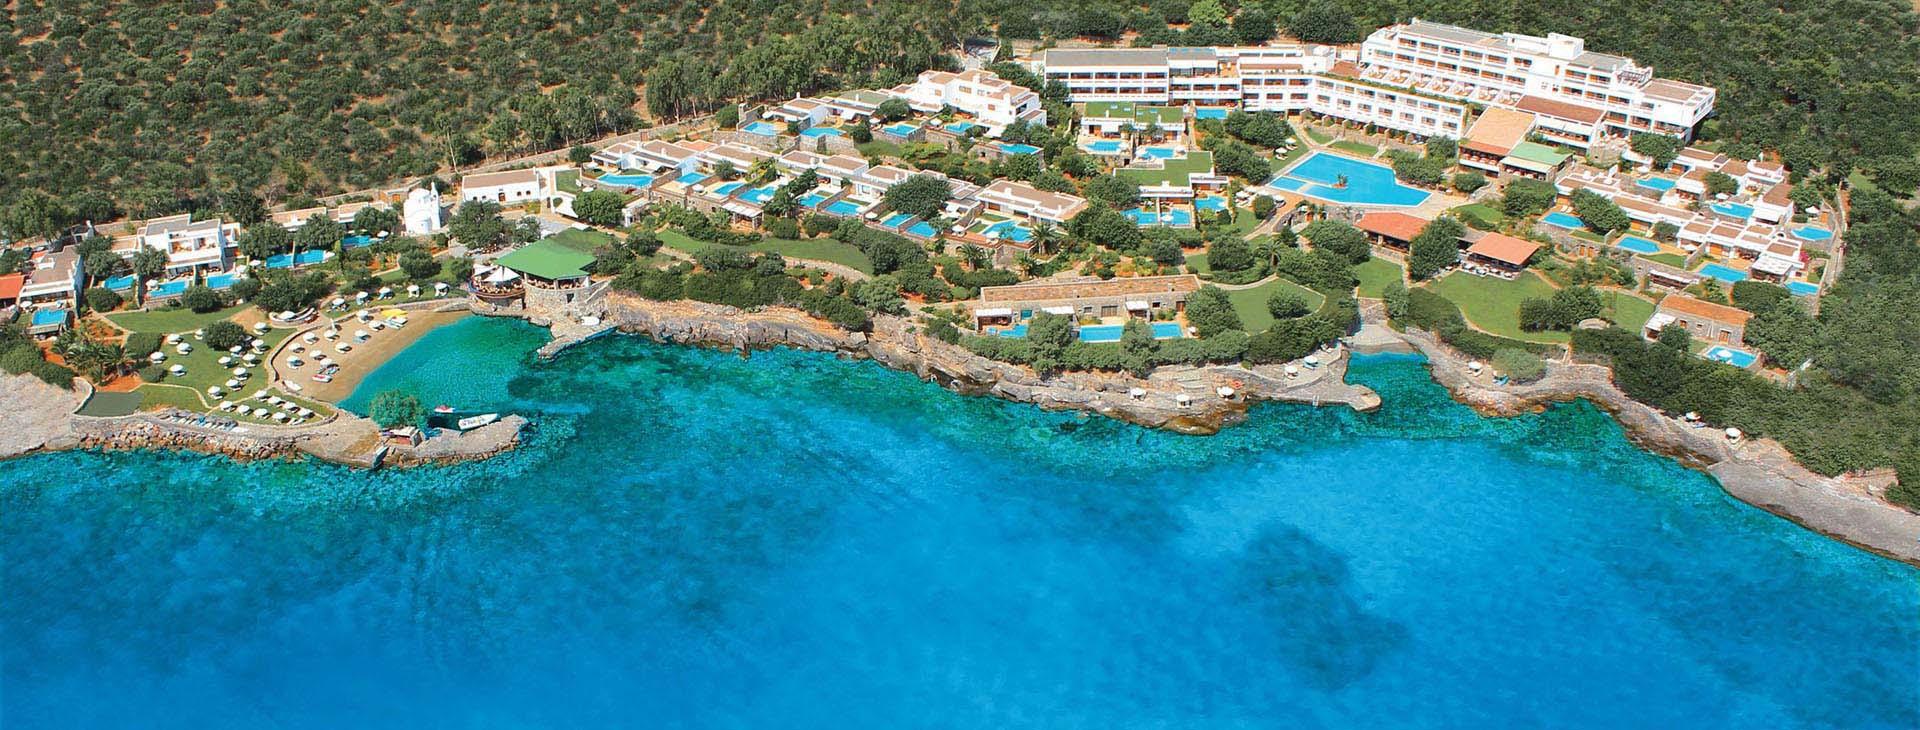 Elounda Mare Hotel - Relais Châteaux